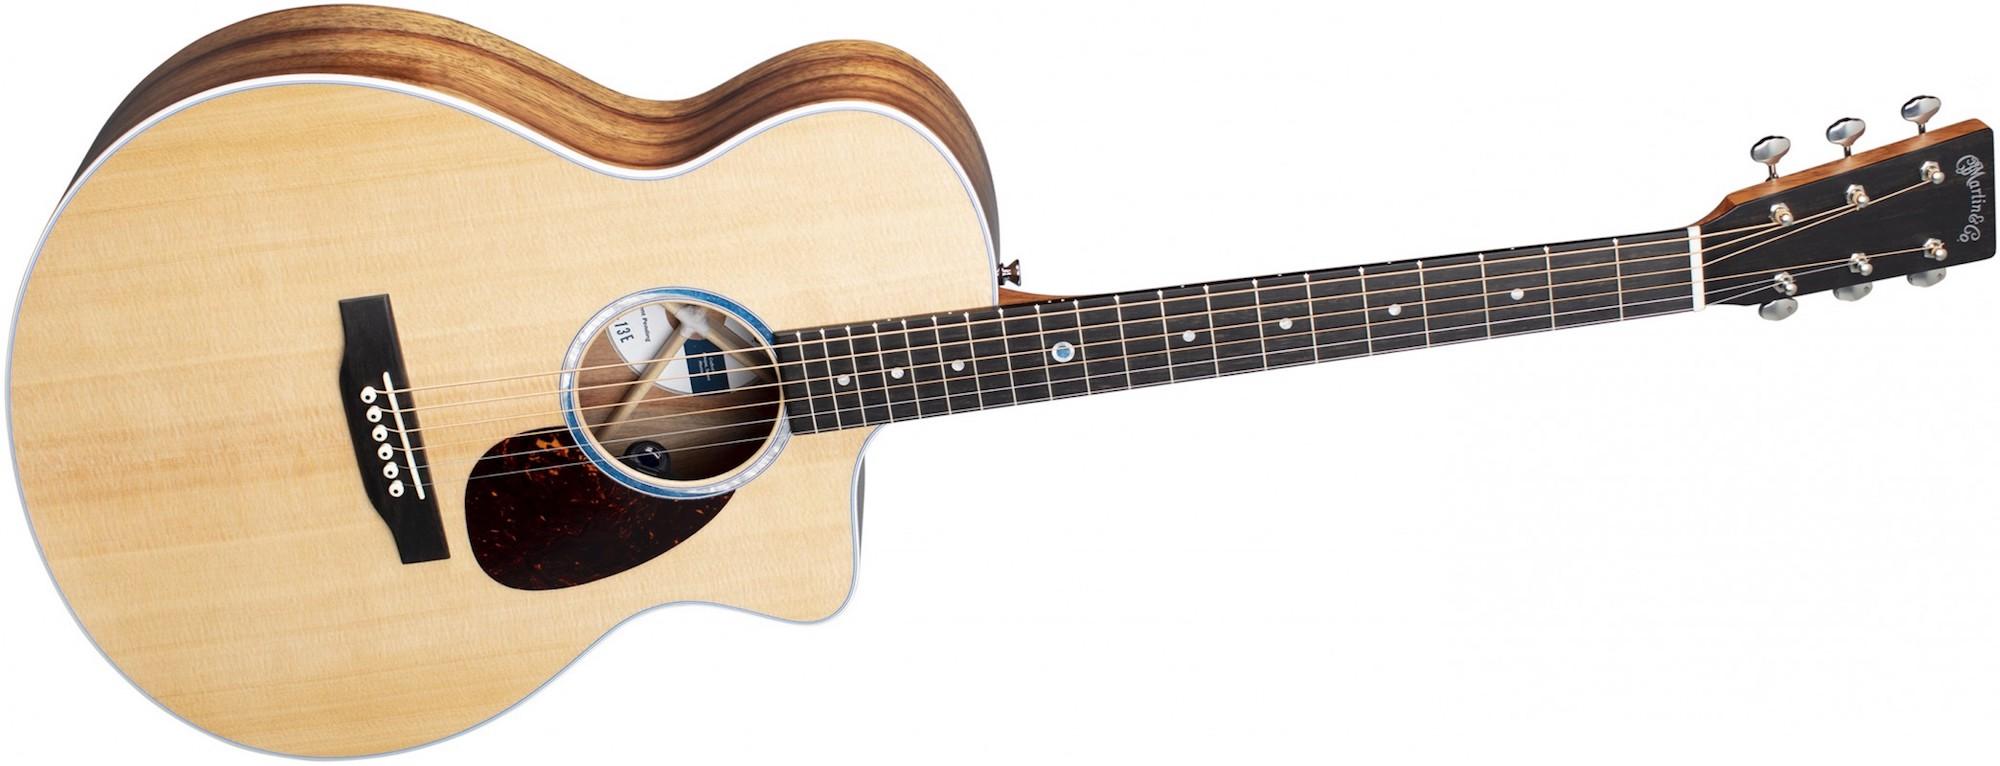 Martin SC-13e chitarra acustica elettroacustica amplificata guitar acoustic-electric eko music group